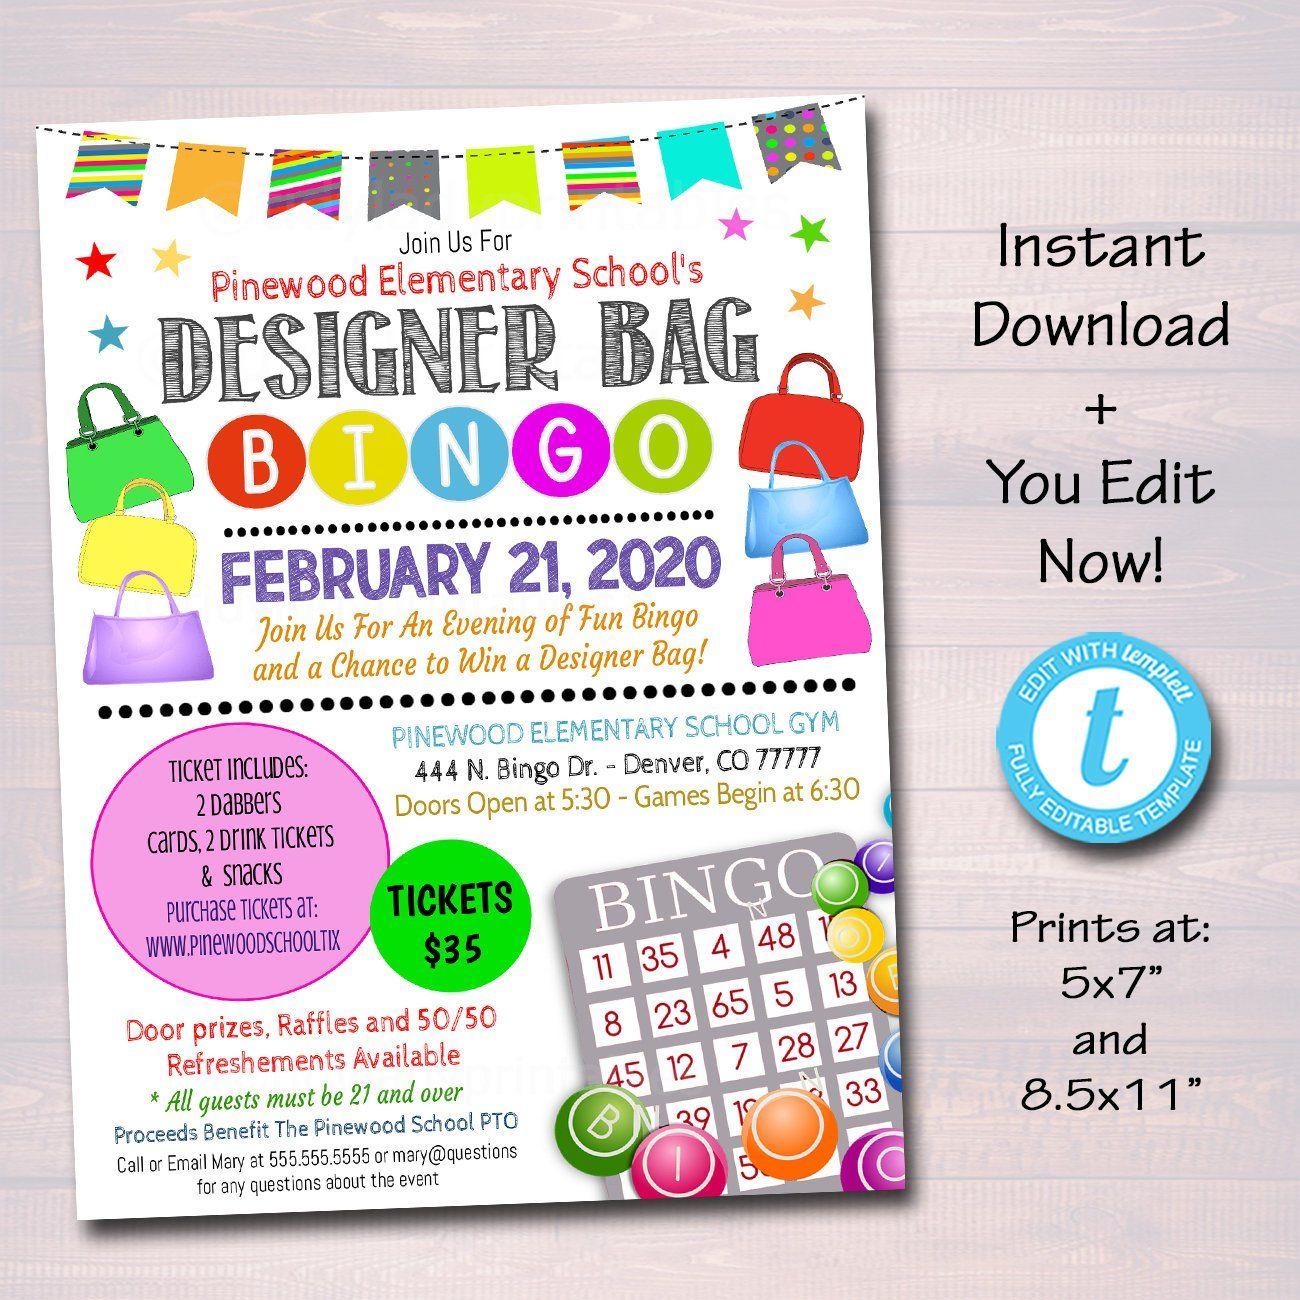 Designer Bag Bingo Night Flyer Printable Template Bingo Bingo Night Flyer